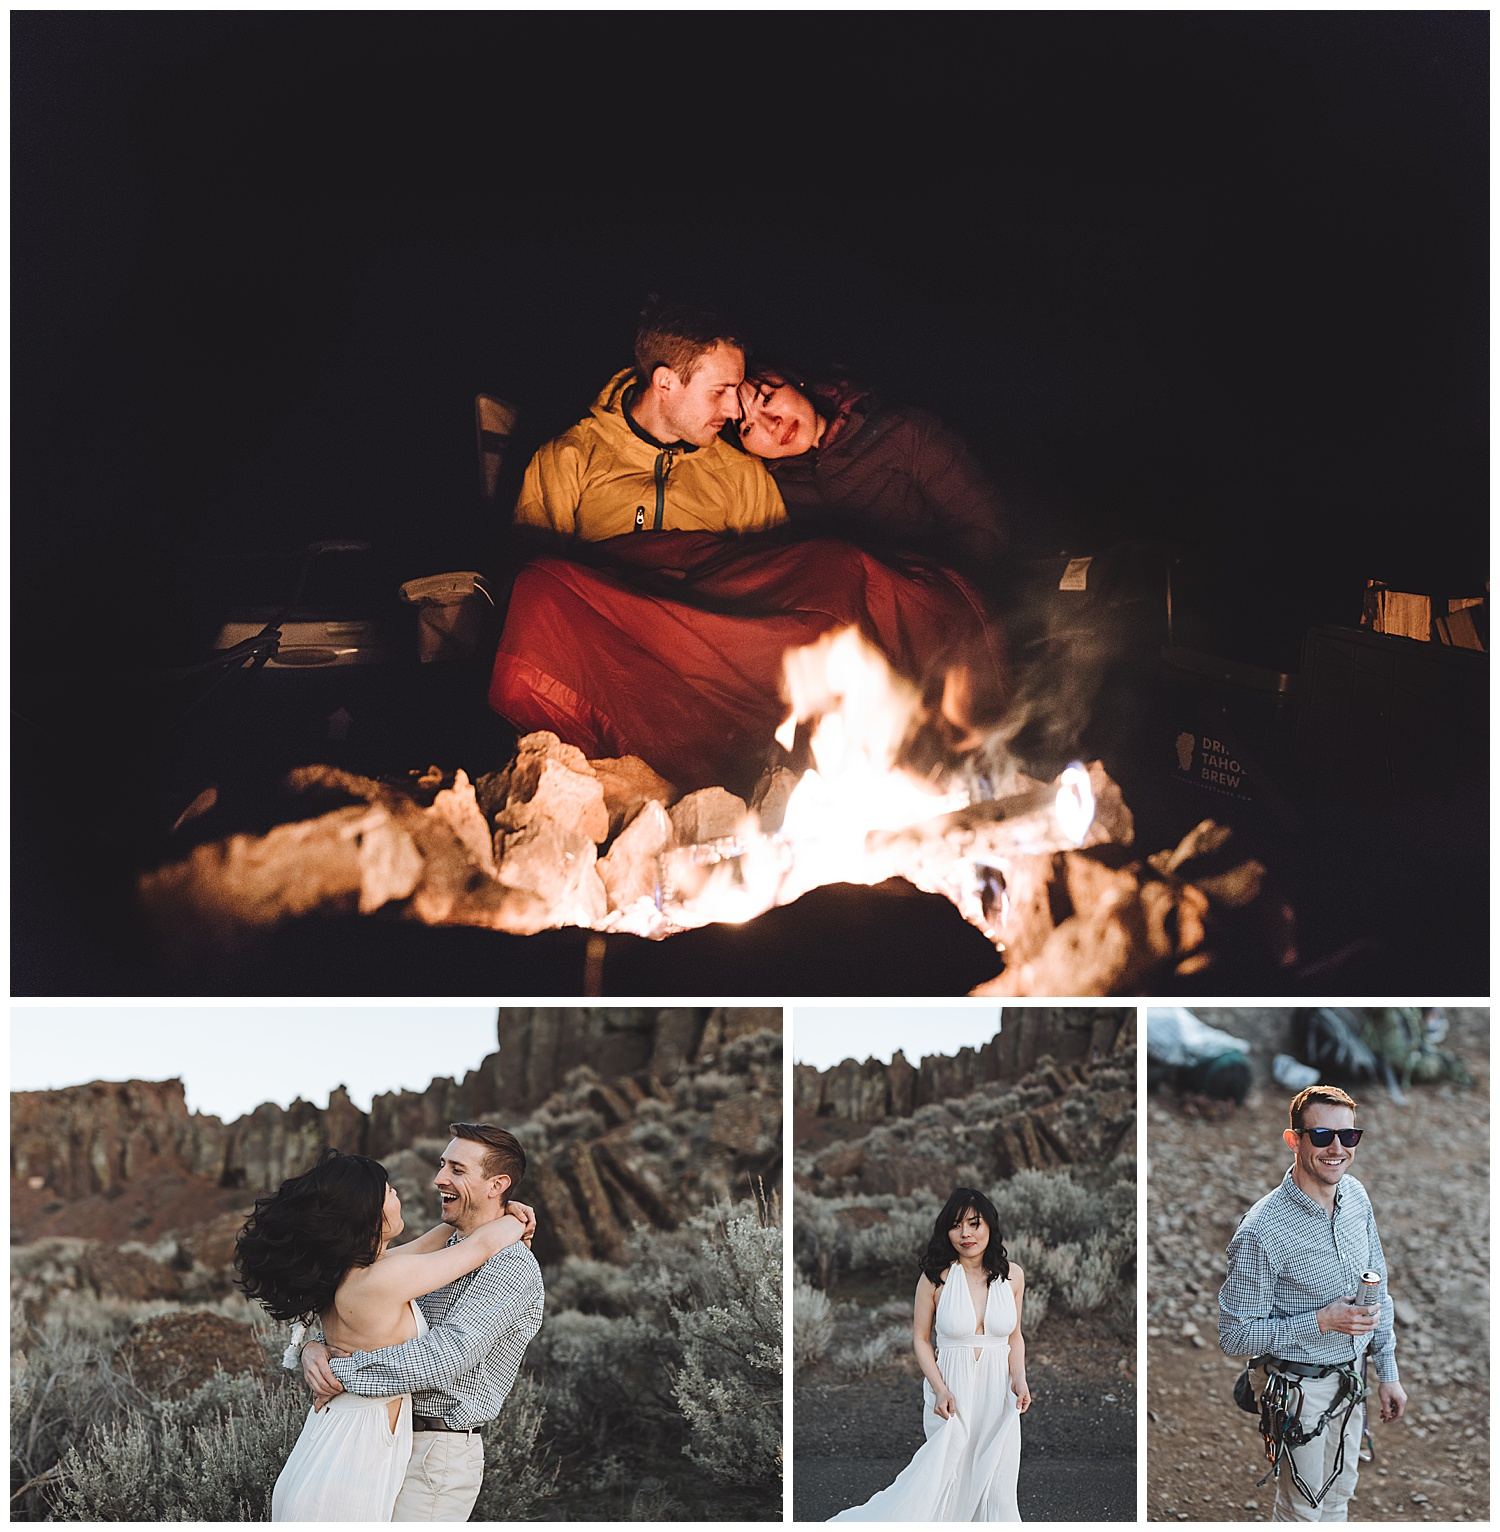 Rock-climbing-engagement-photo-shoot_Stephanie-Keegan-Photography_10.jpg